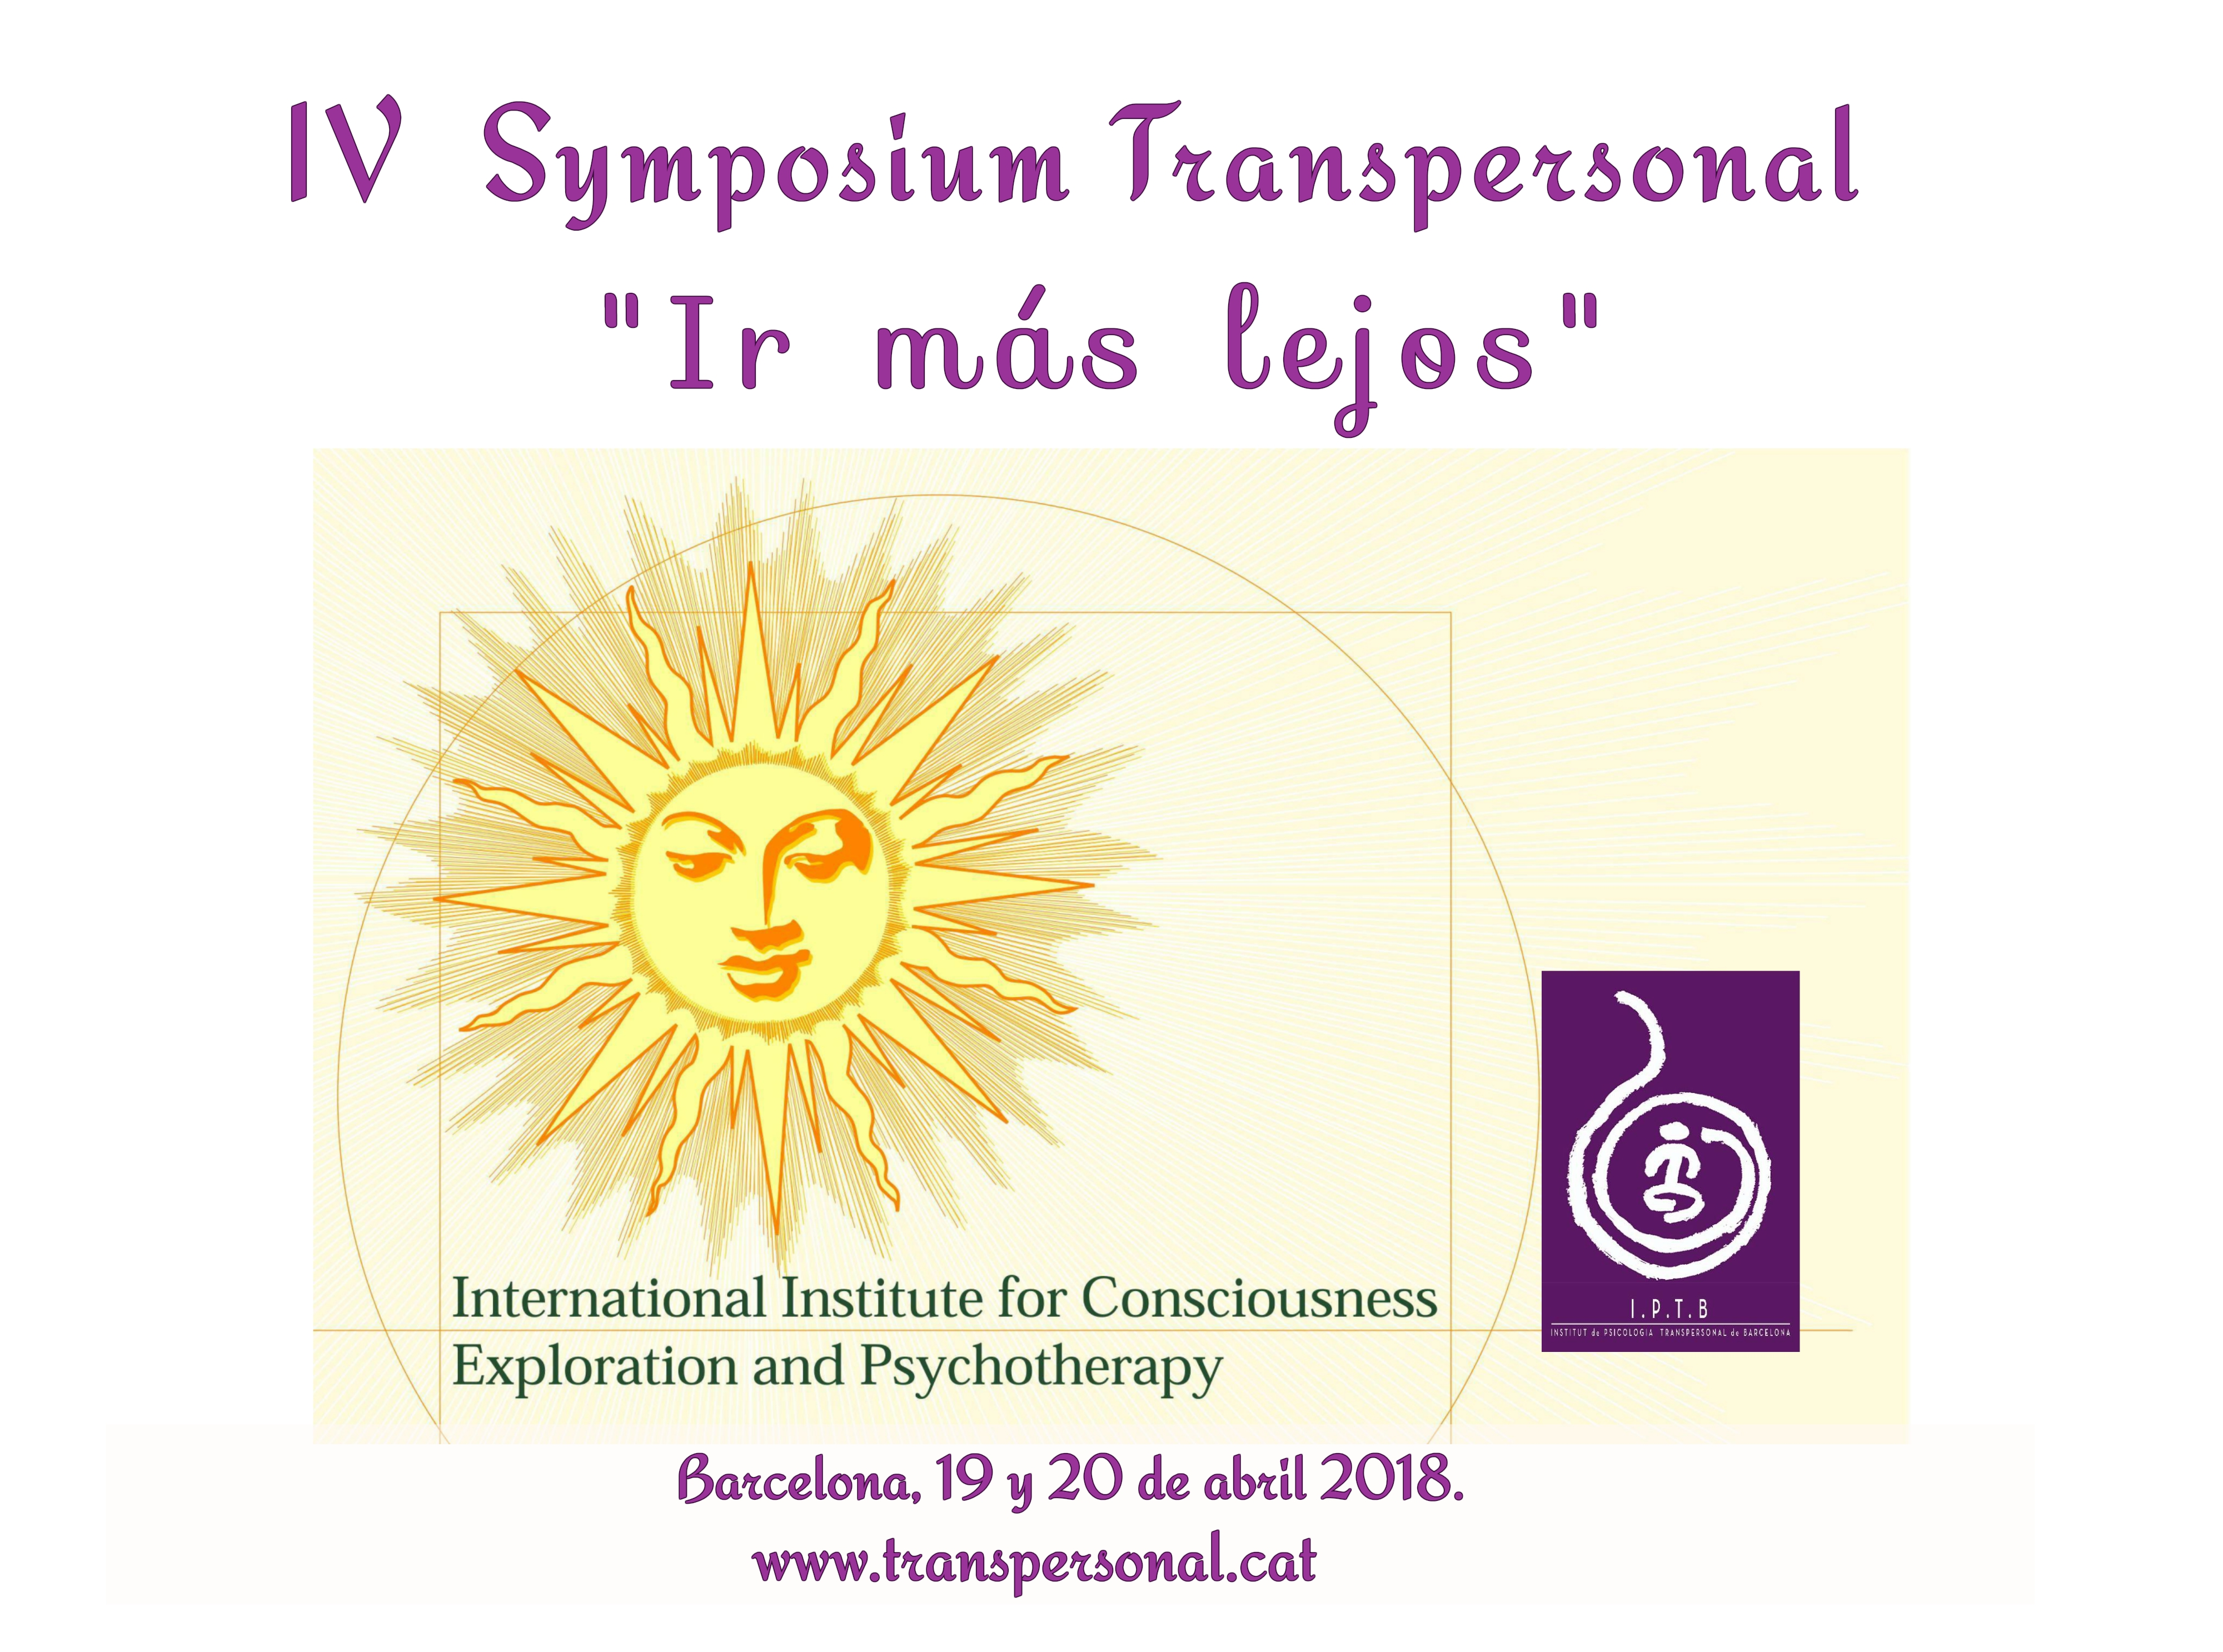 (Español) IV SYMPOSIUM TRANSPERSONAL